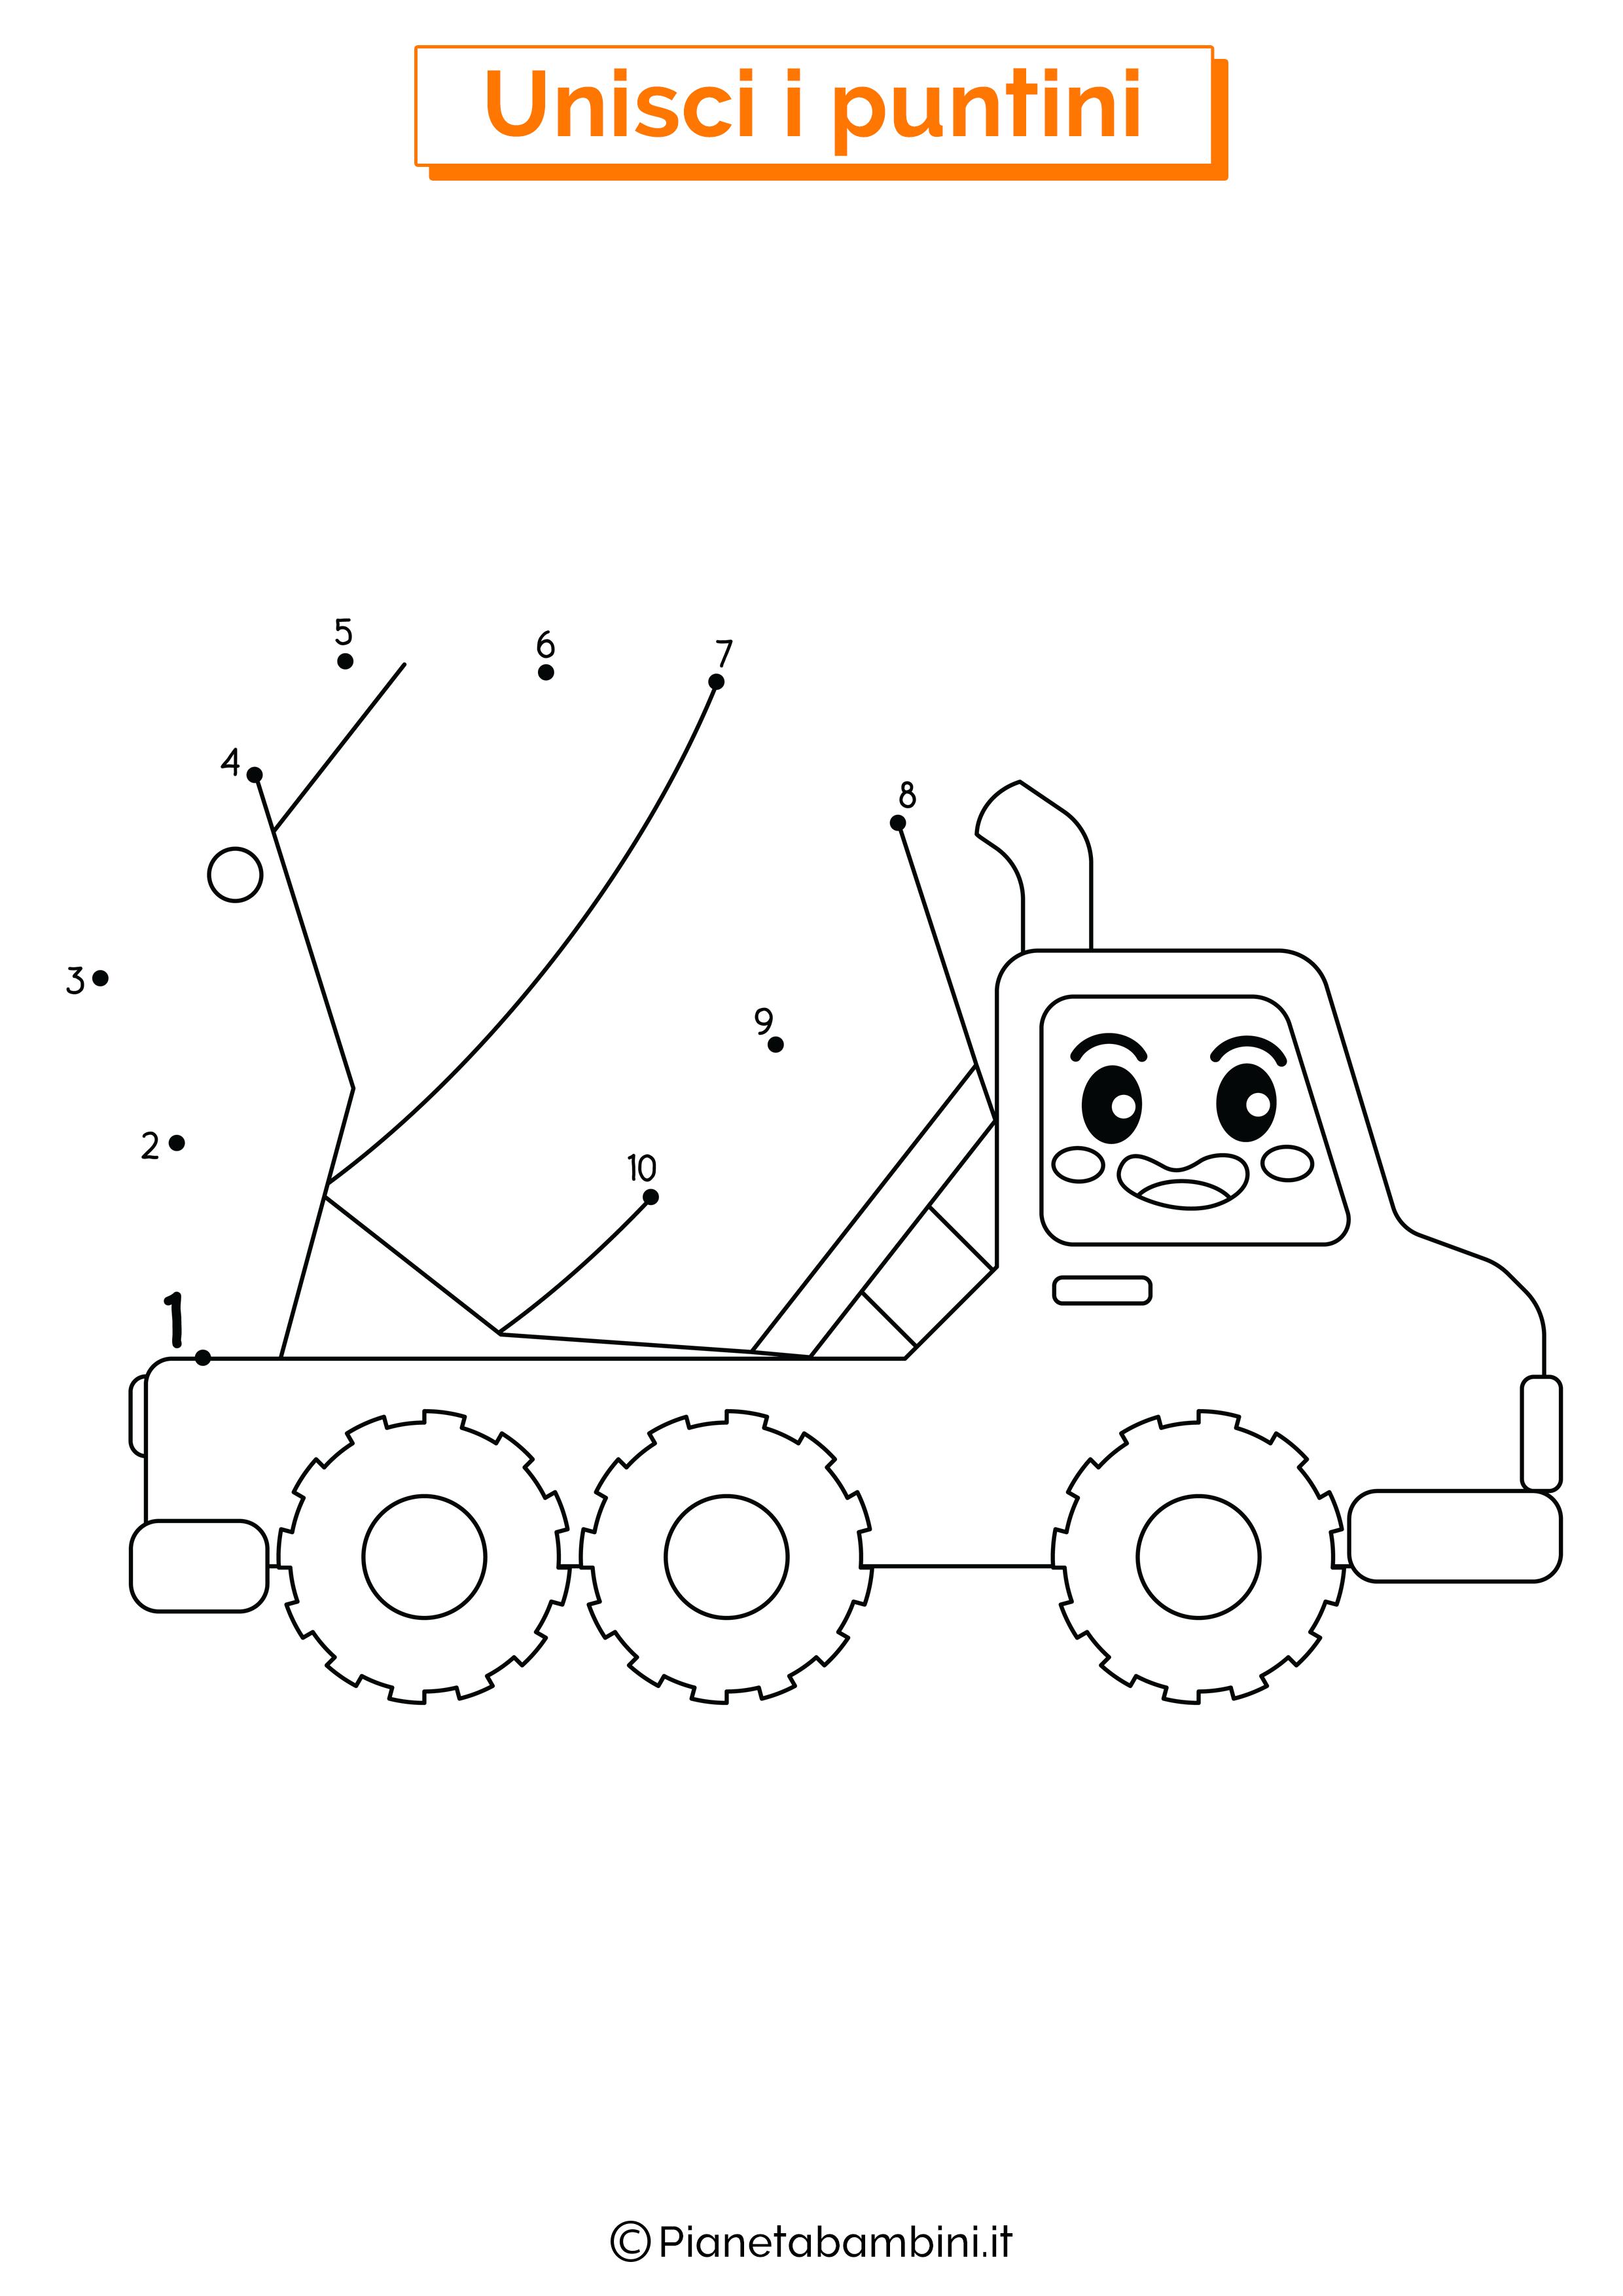 Disegno unisci i puntini da 1 a 10 camion betoniera